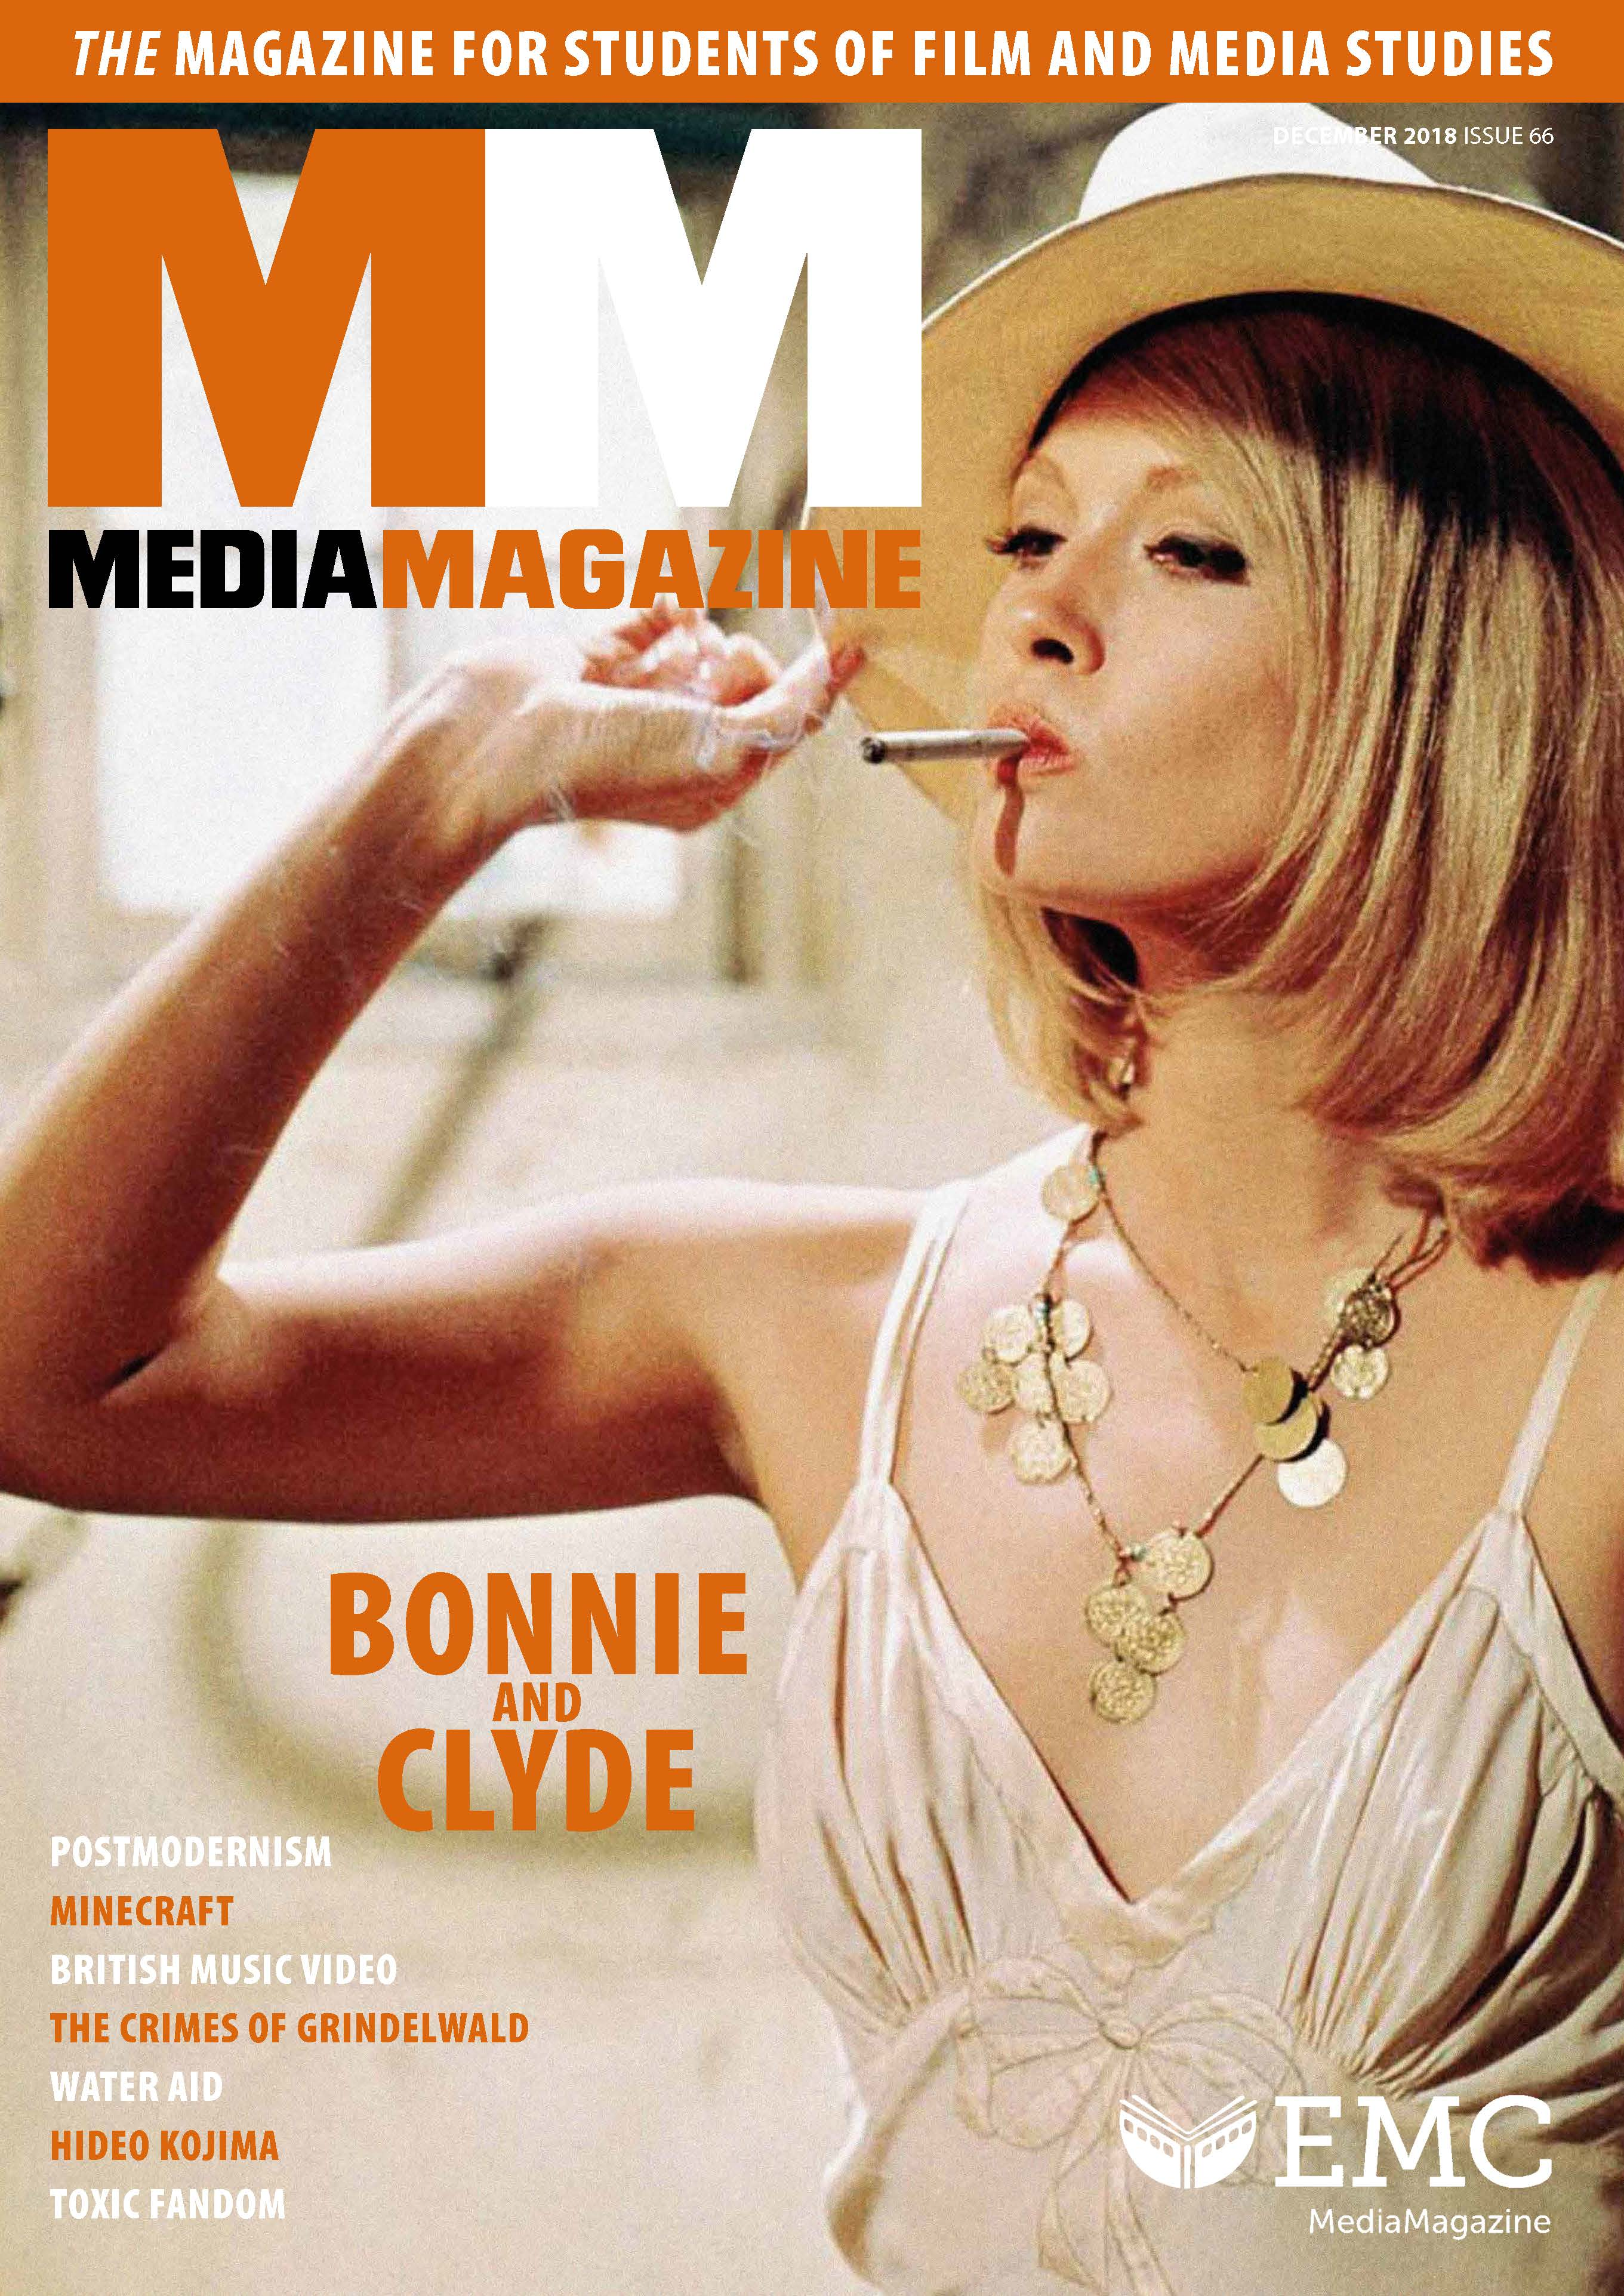 MediaMagazine 66 front cover